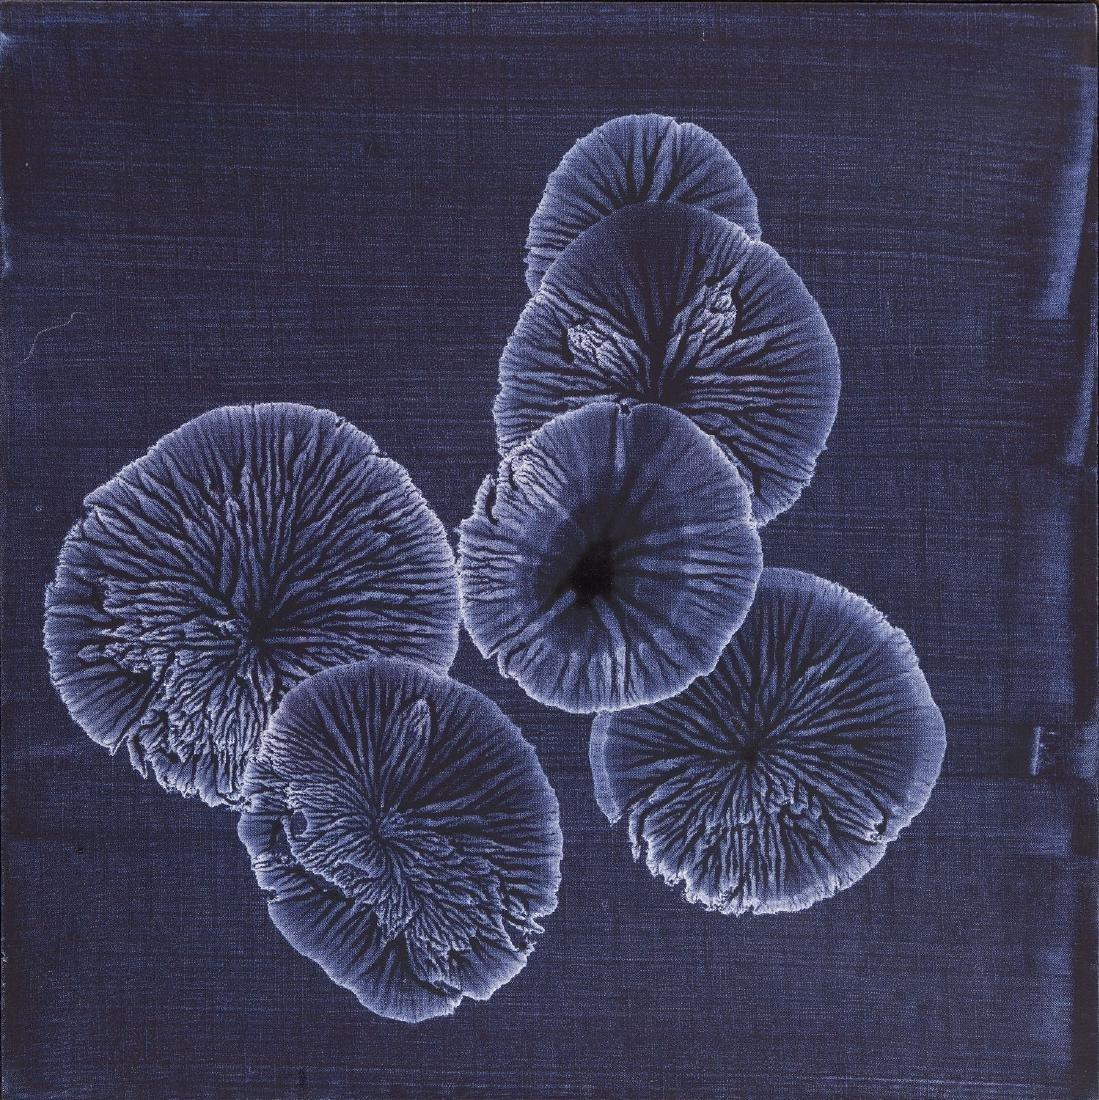 Rafal Bujnowski (b. 1974) Untitled (From Colonies